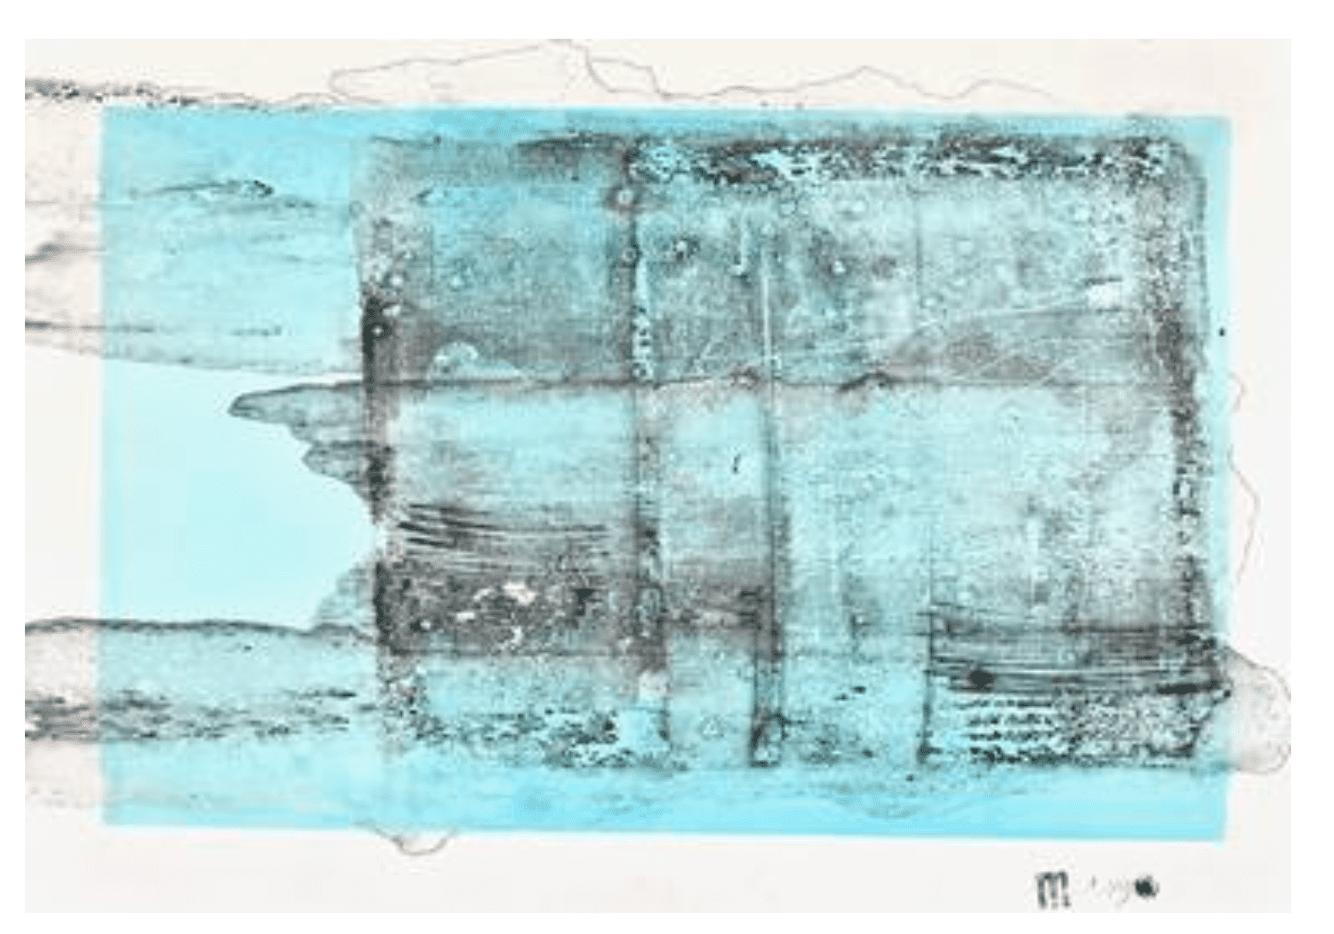 Abstract art piece by Michael Lentz